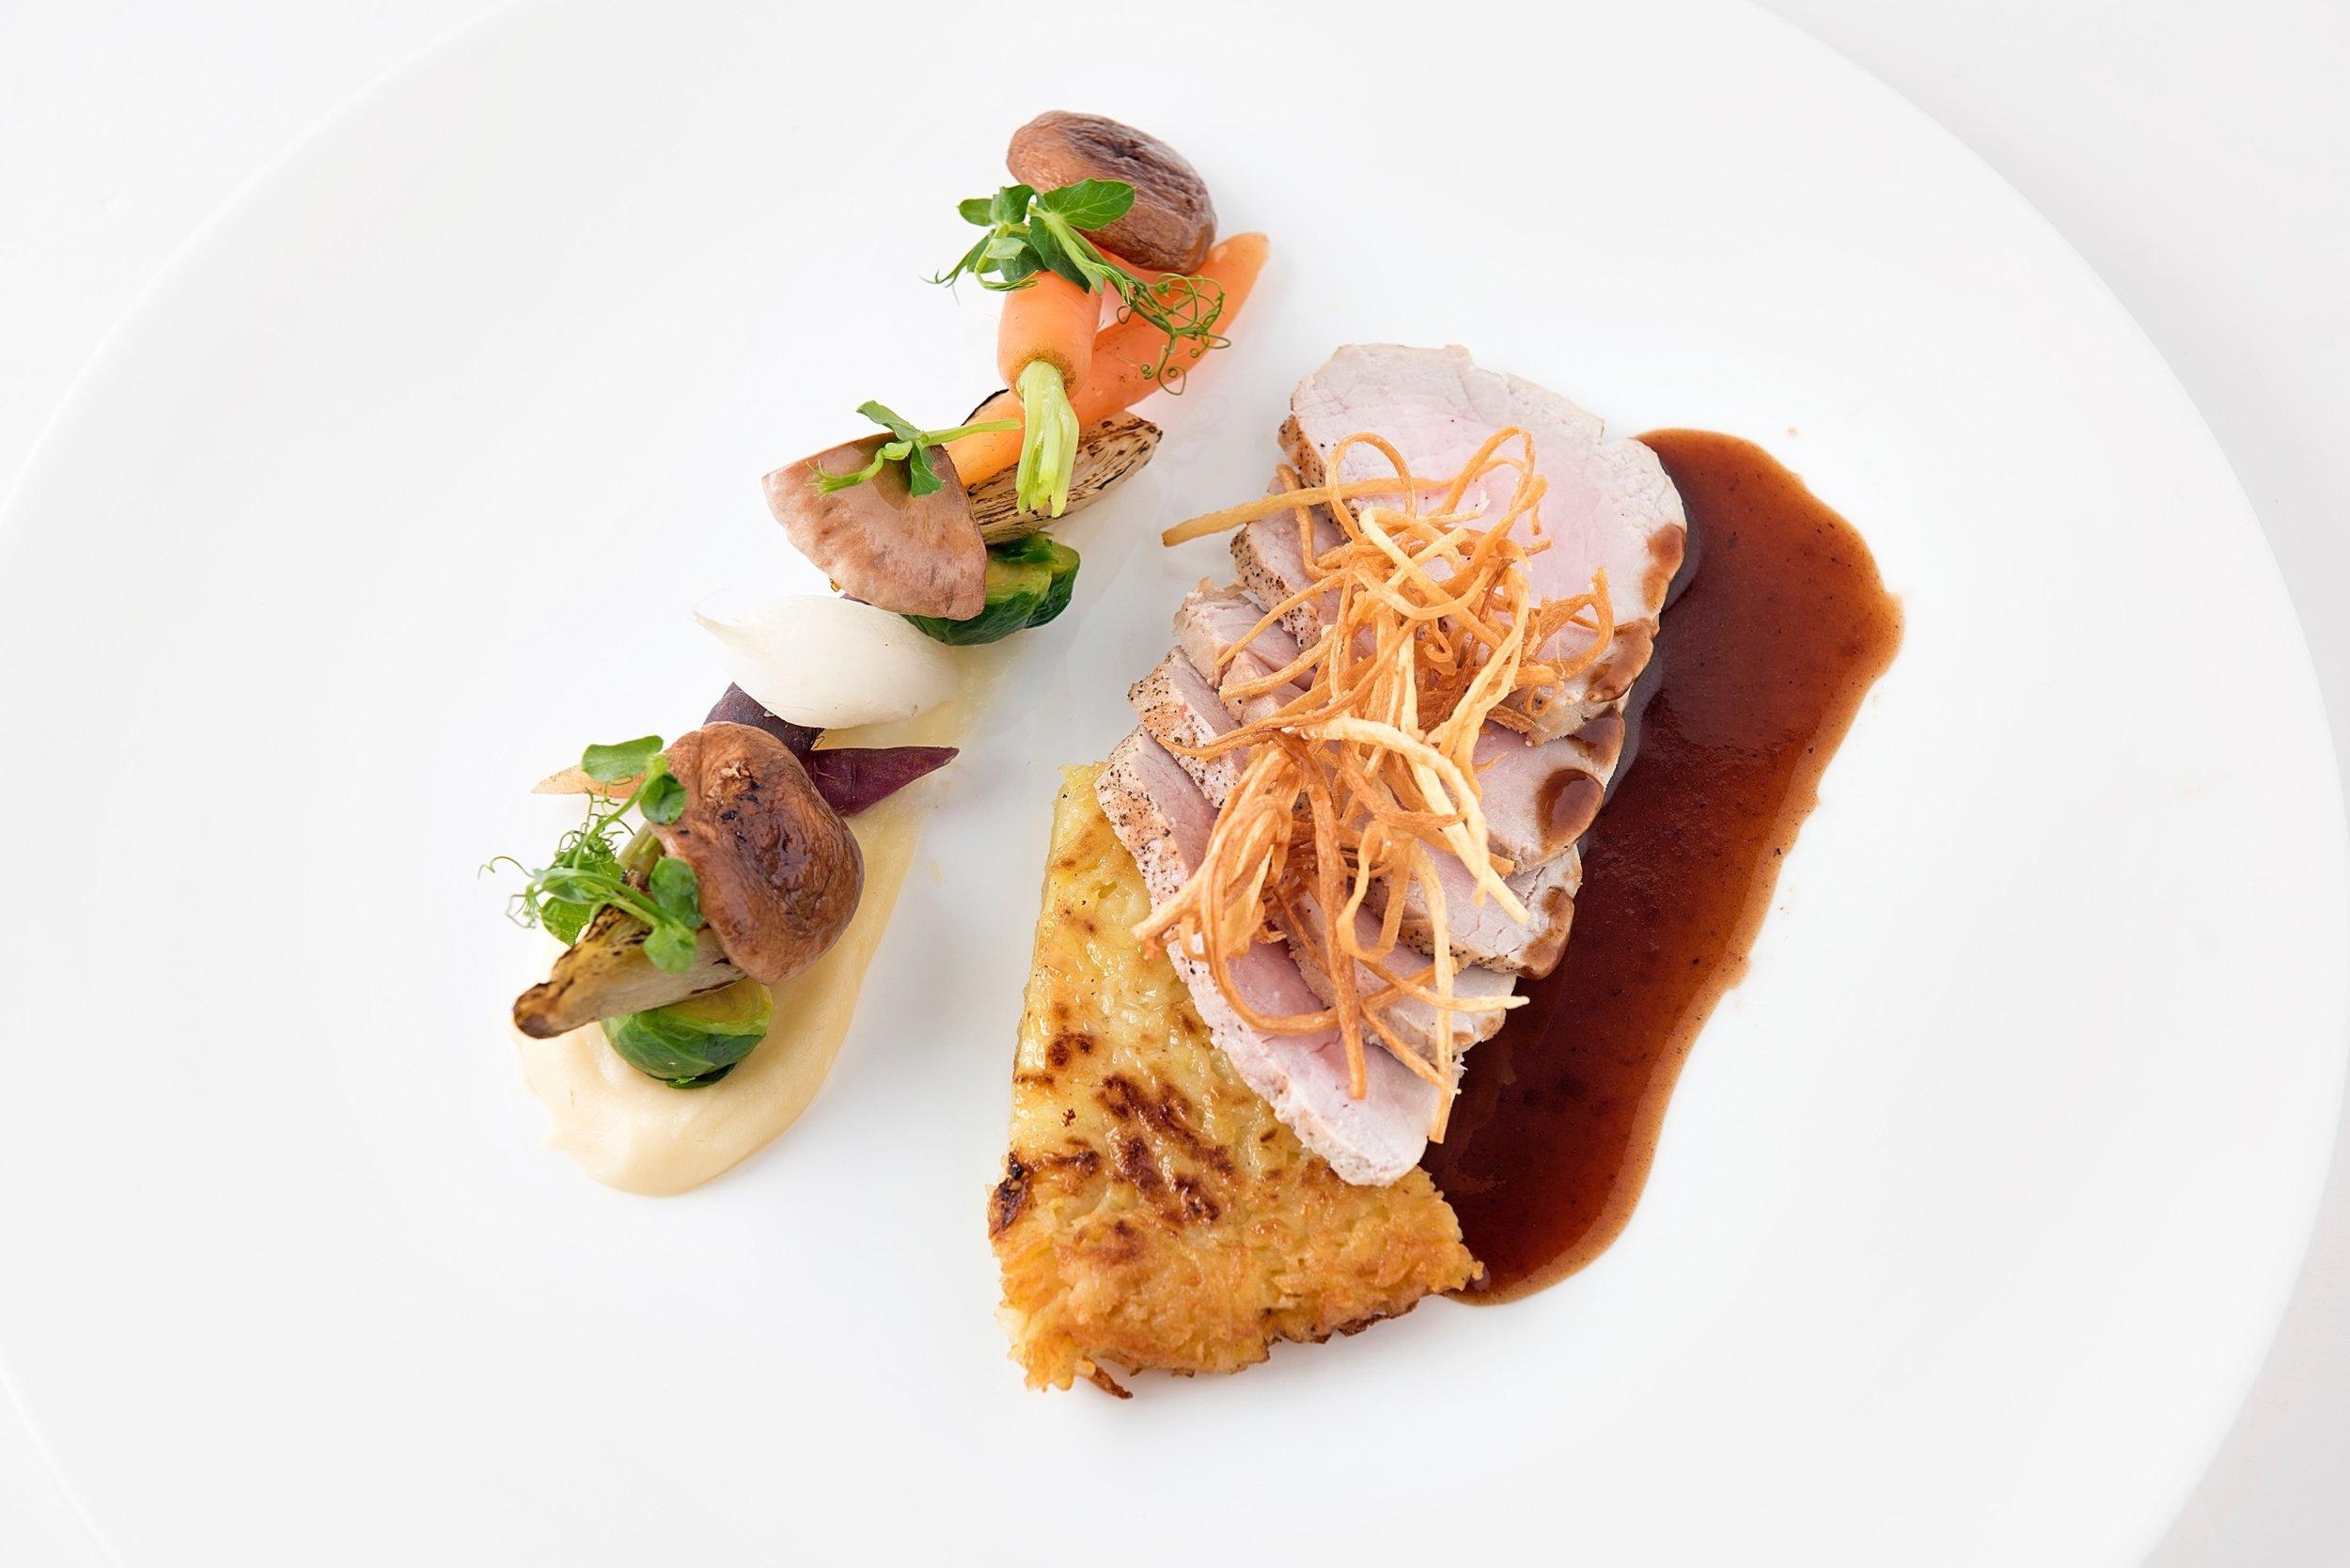 13 michelin restaurant the glorious antwerpen tablefever bart albrecht.jpg